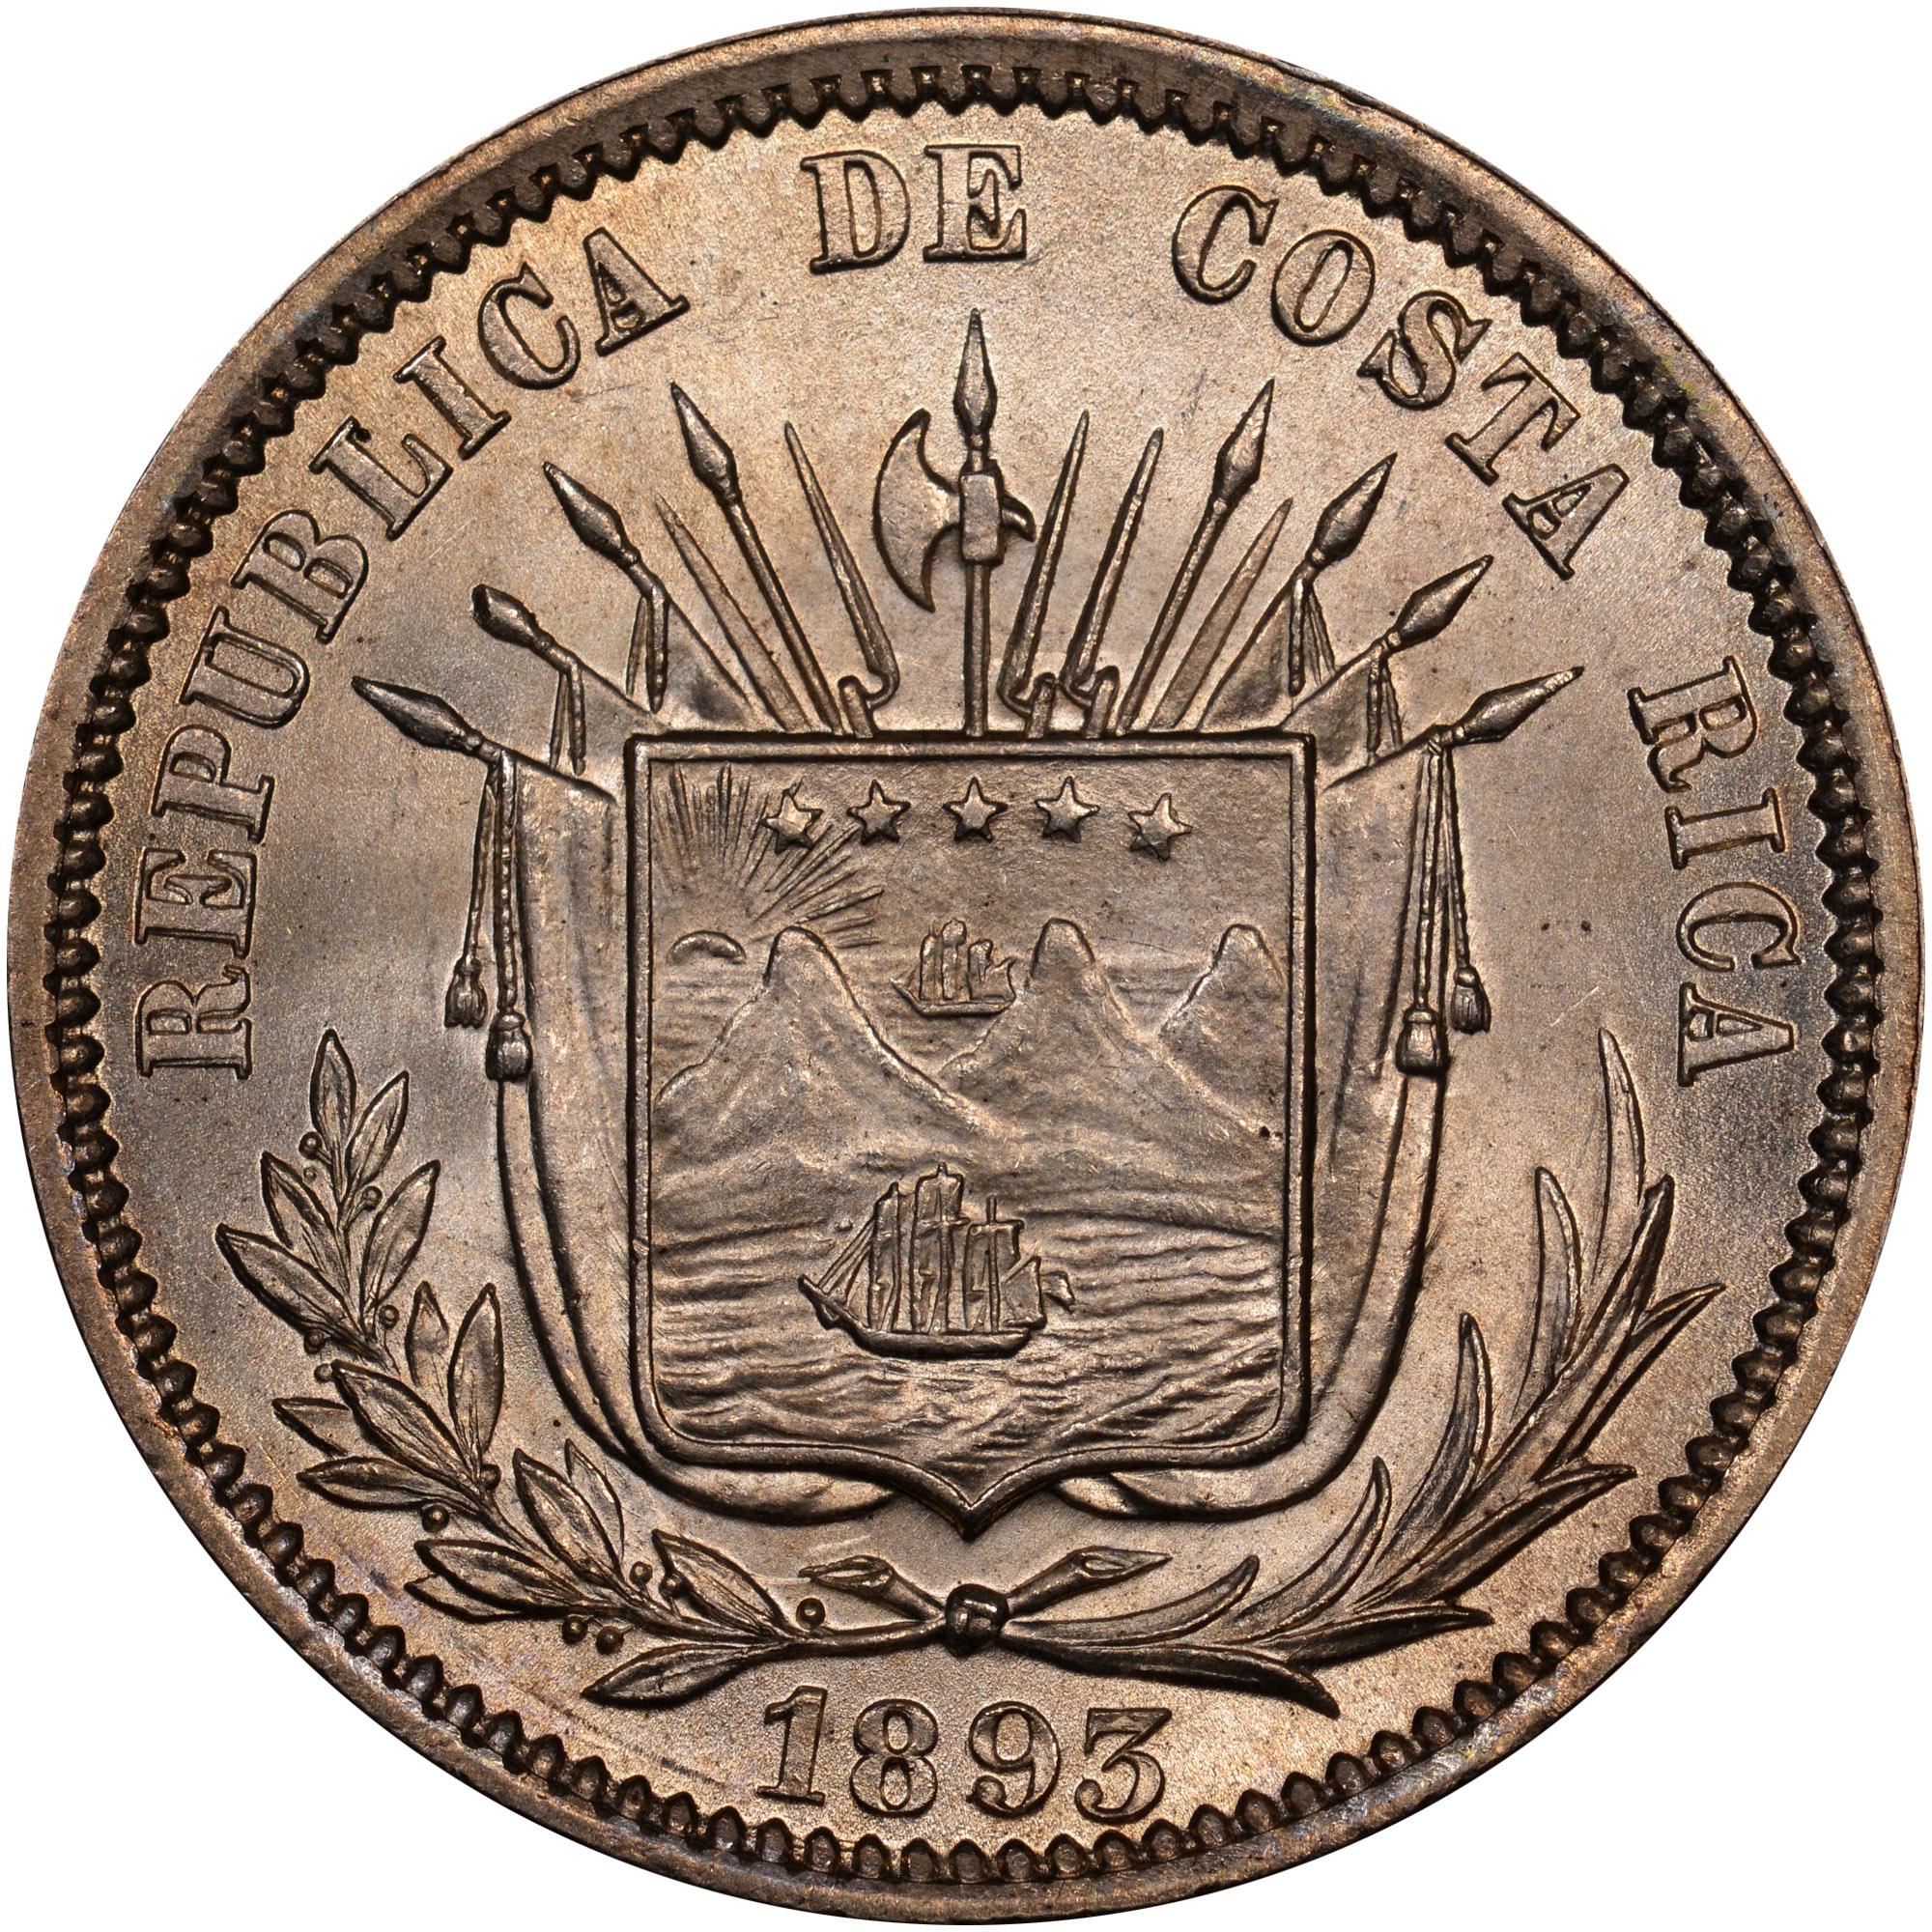 1889-1893 Costa Rica 25 Centavos obverse